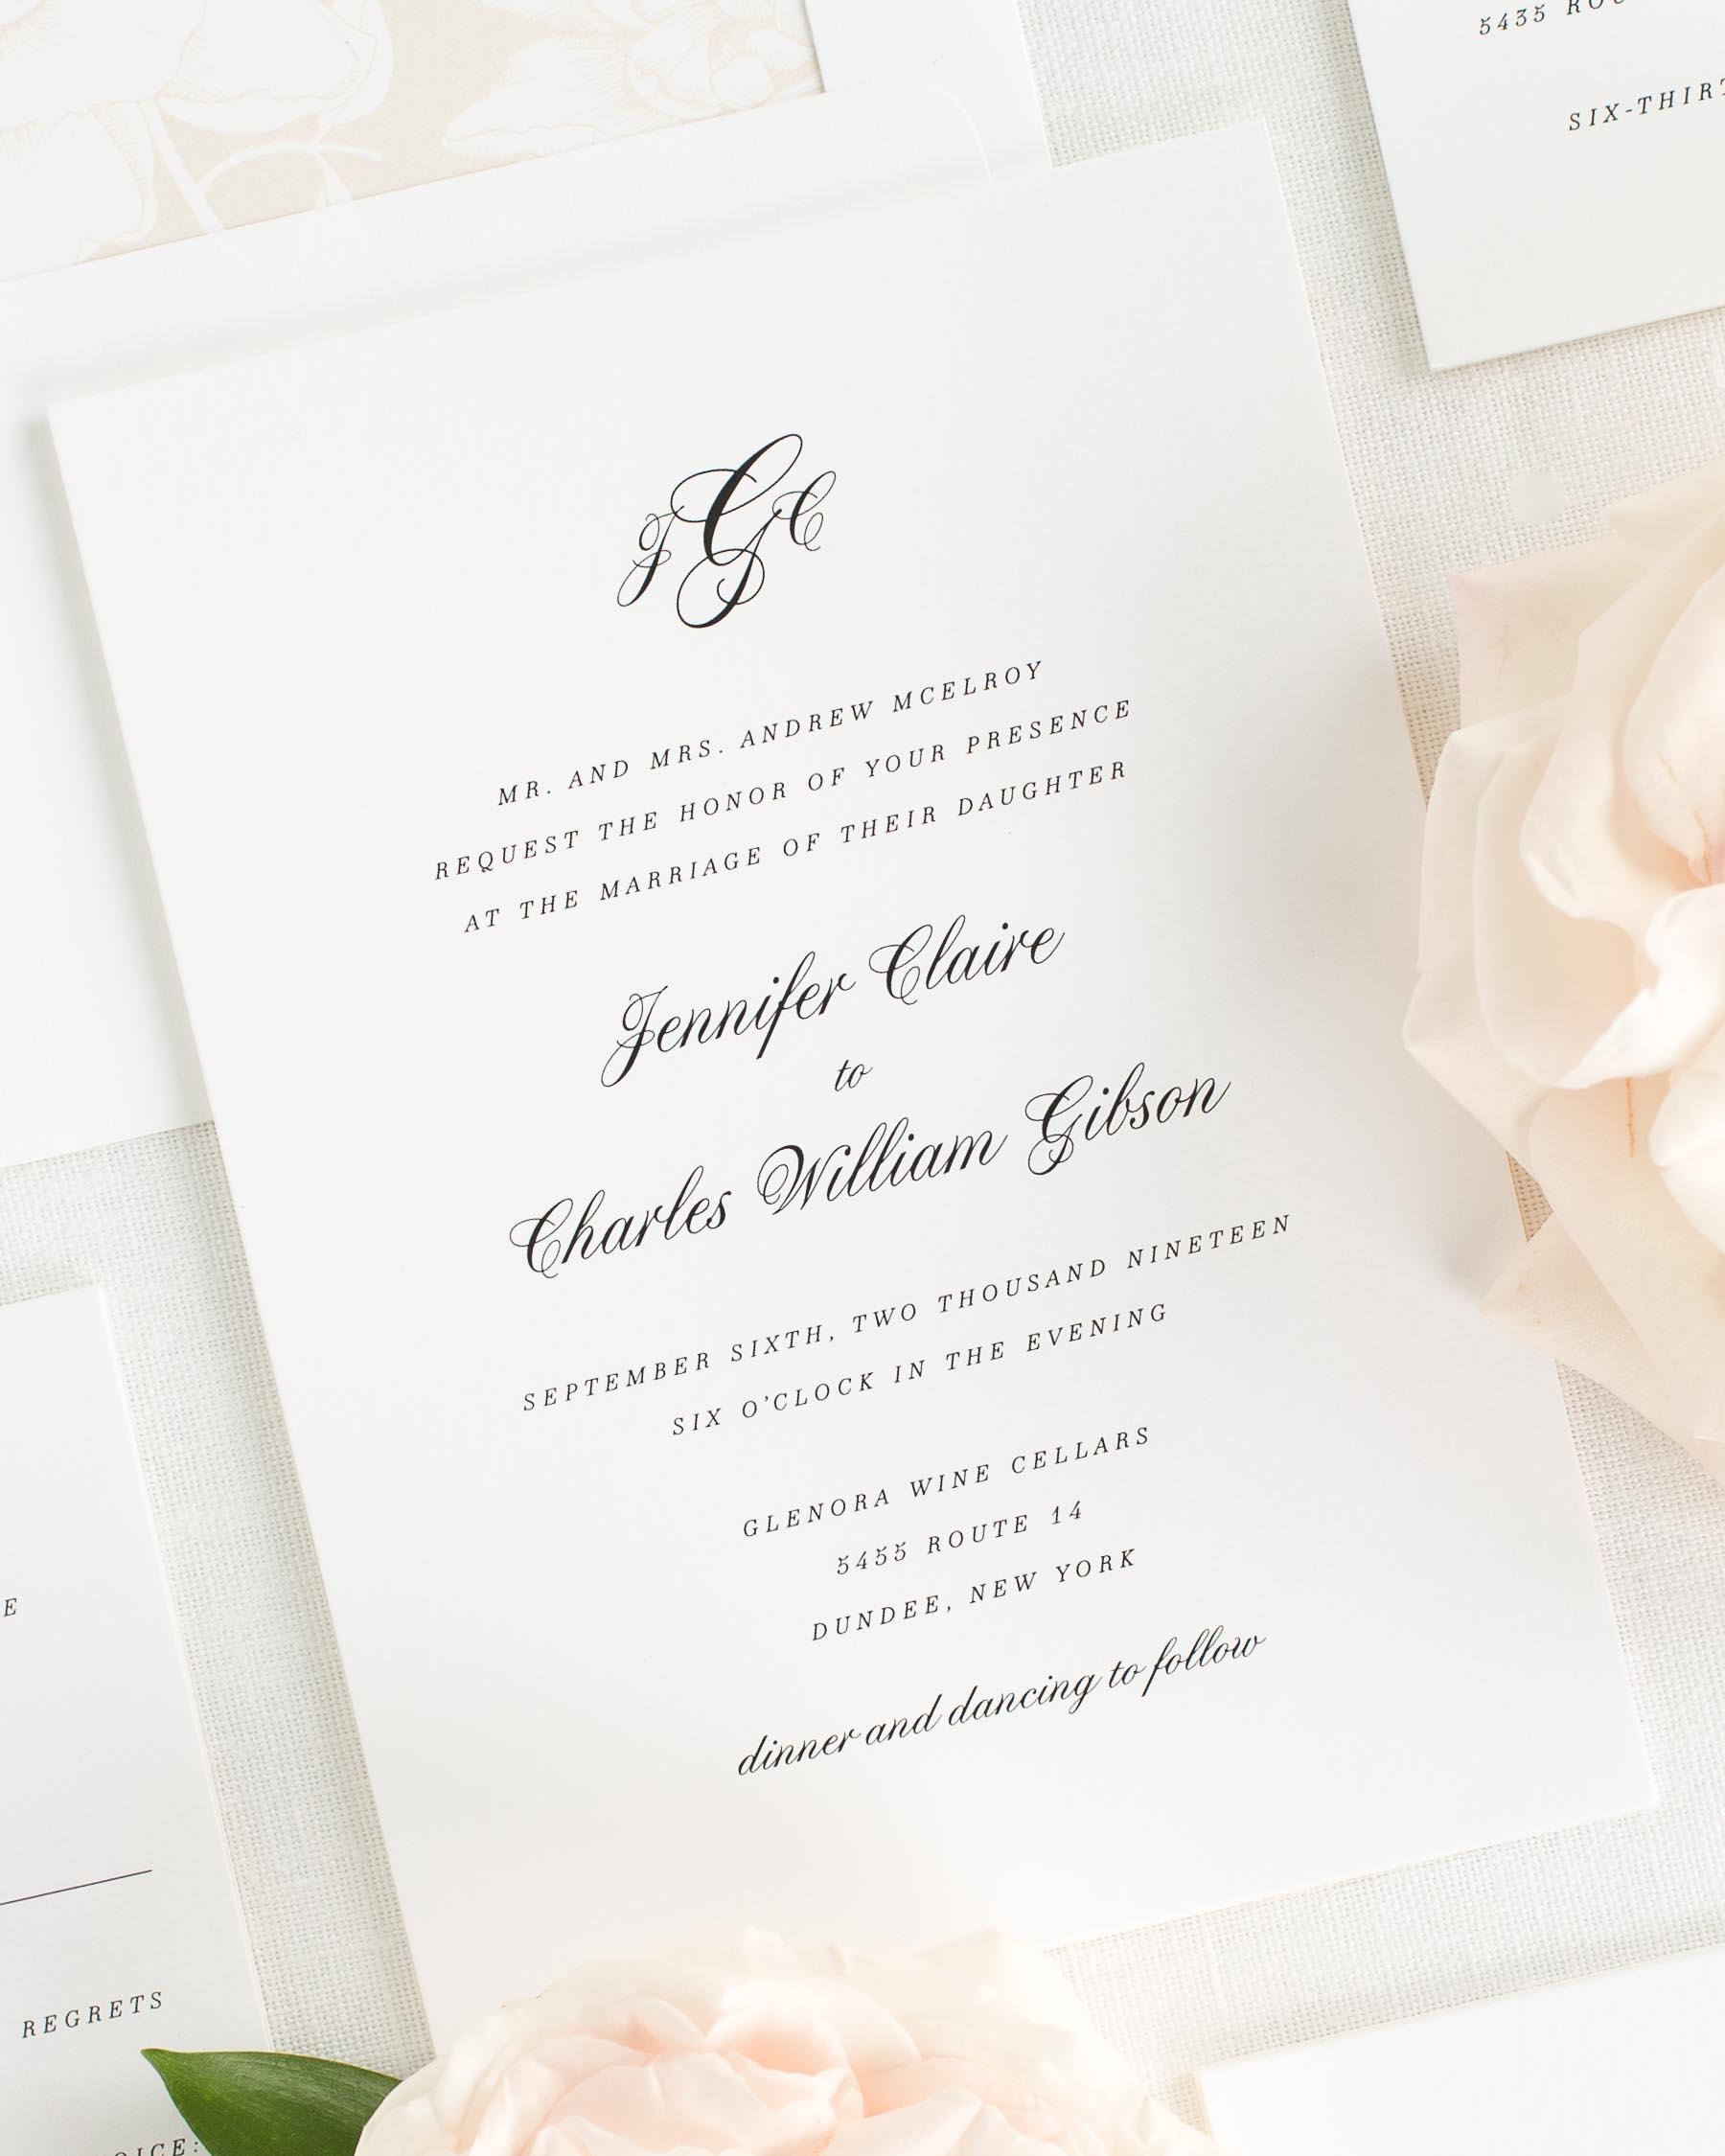 Wedding Invitations Wedding Invitation Samples Classy Wedding Invitations Wedding Invitations